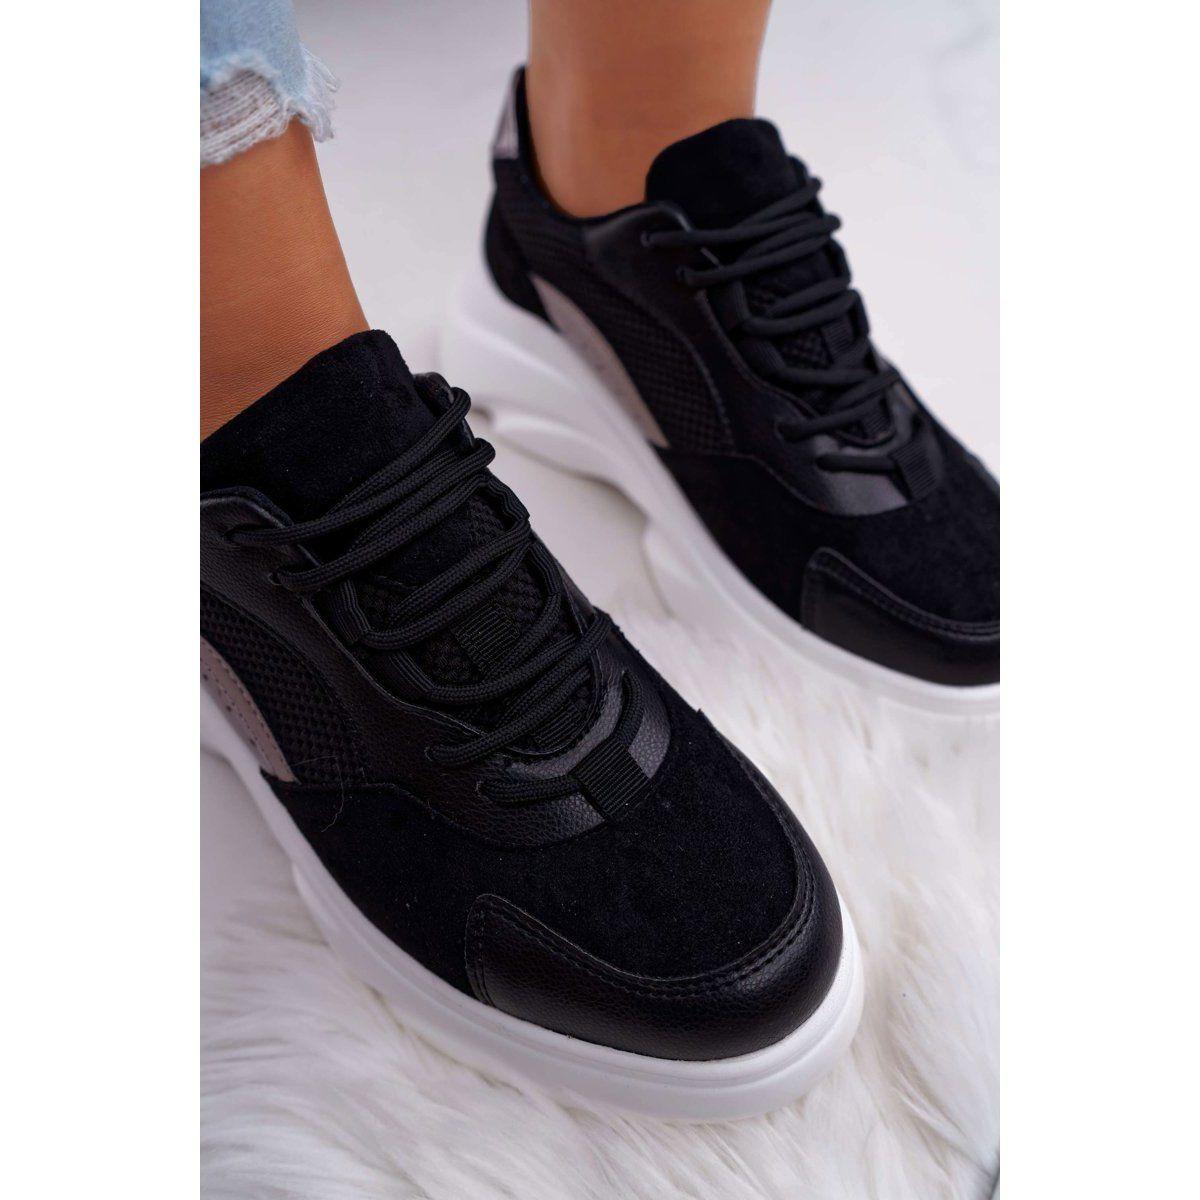 Sea Sportowe Damskie Buty Gruba Podeszwa Czarne Cardamon Air Max Sneakers Sneakers Nike Nike Air